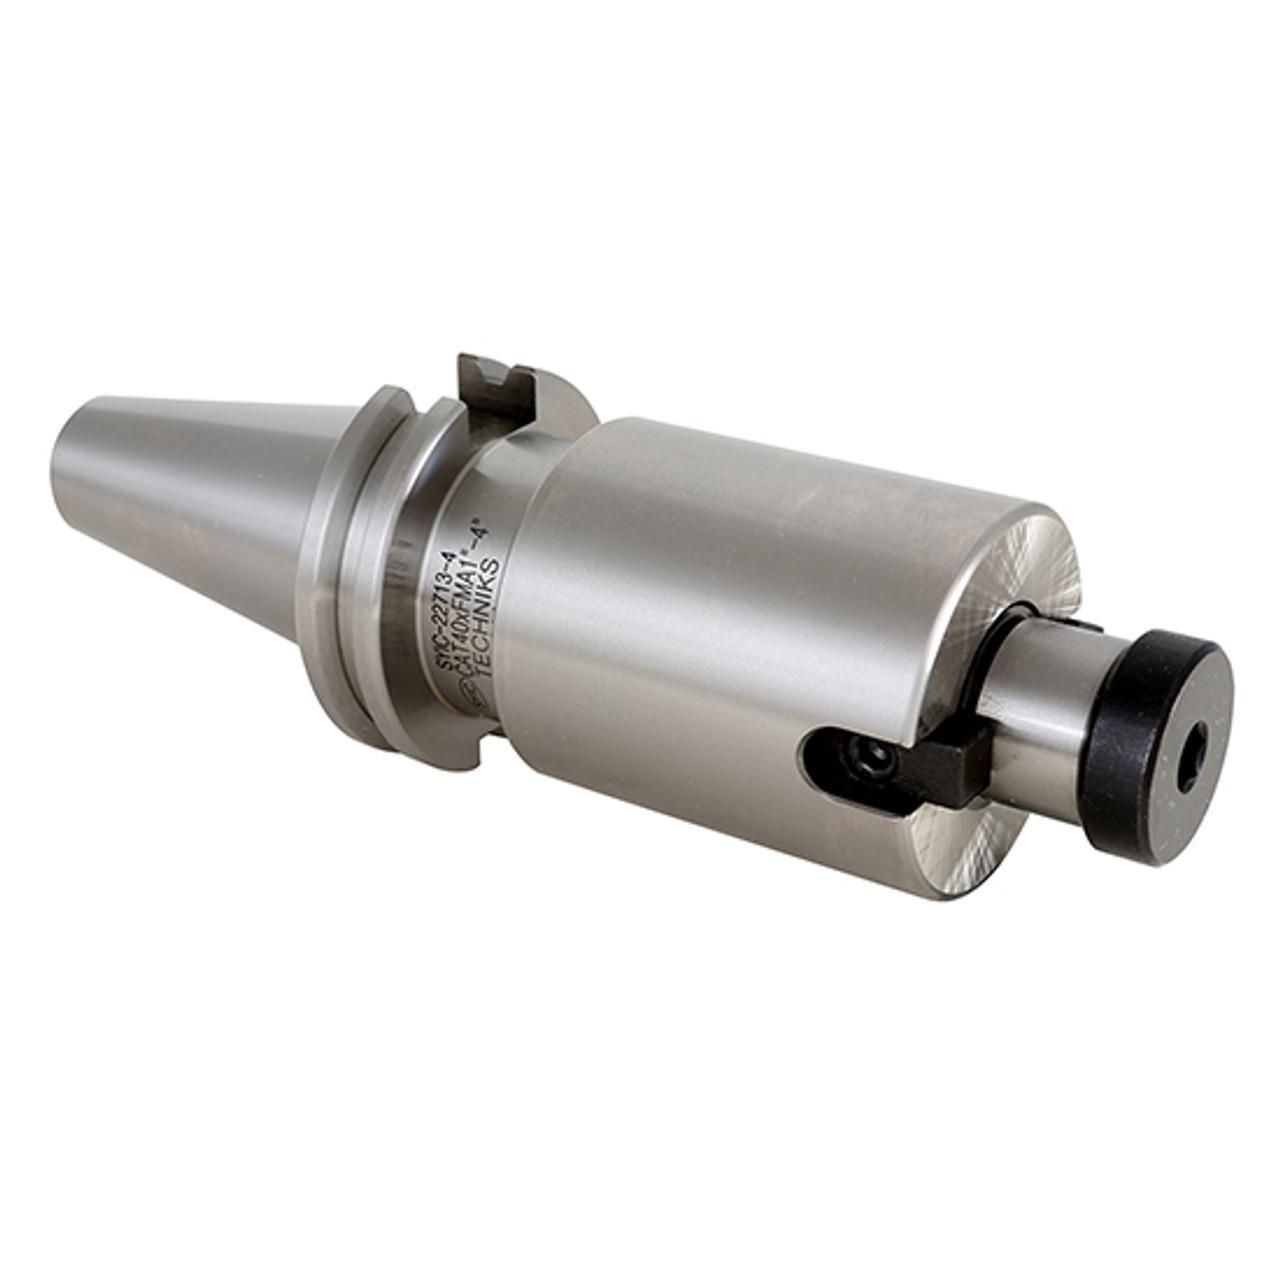 "Techniks BT40 3//4 Face Shell Mill Arbor 6.0/"" Length CAT40 AT3 GROUND 16615-6"